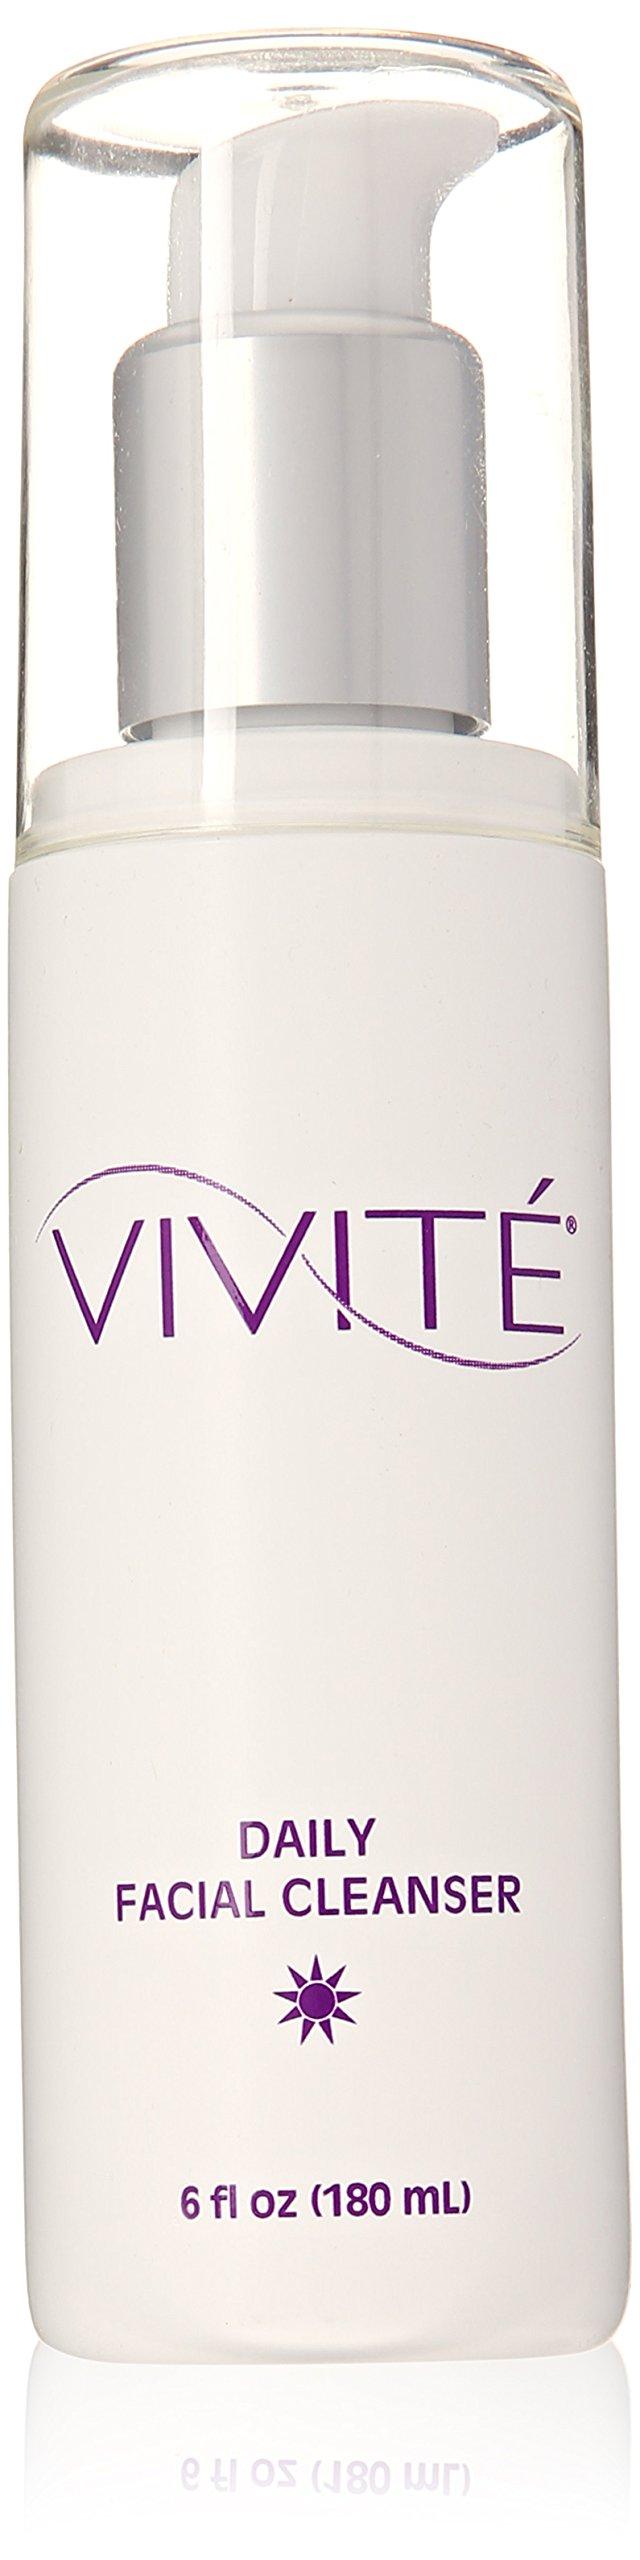 Vivite Daily Facial Cleanser 6 fl oz.